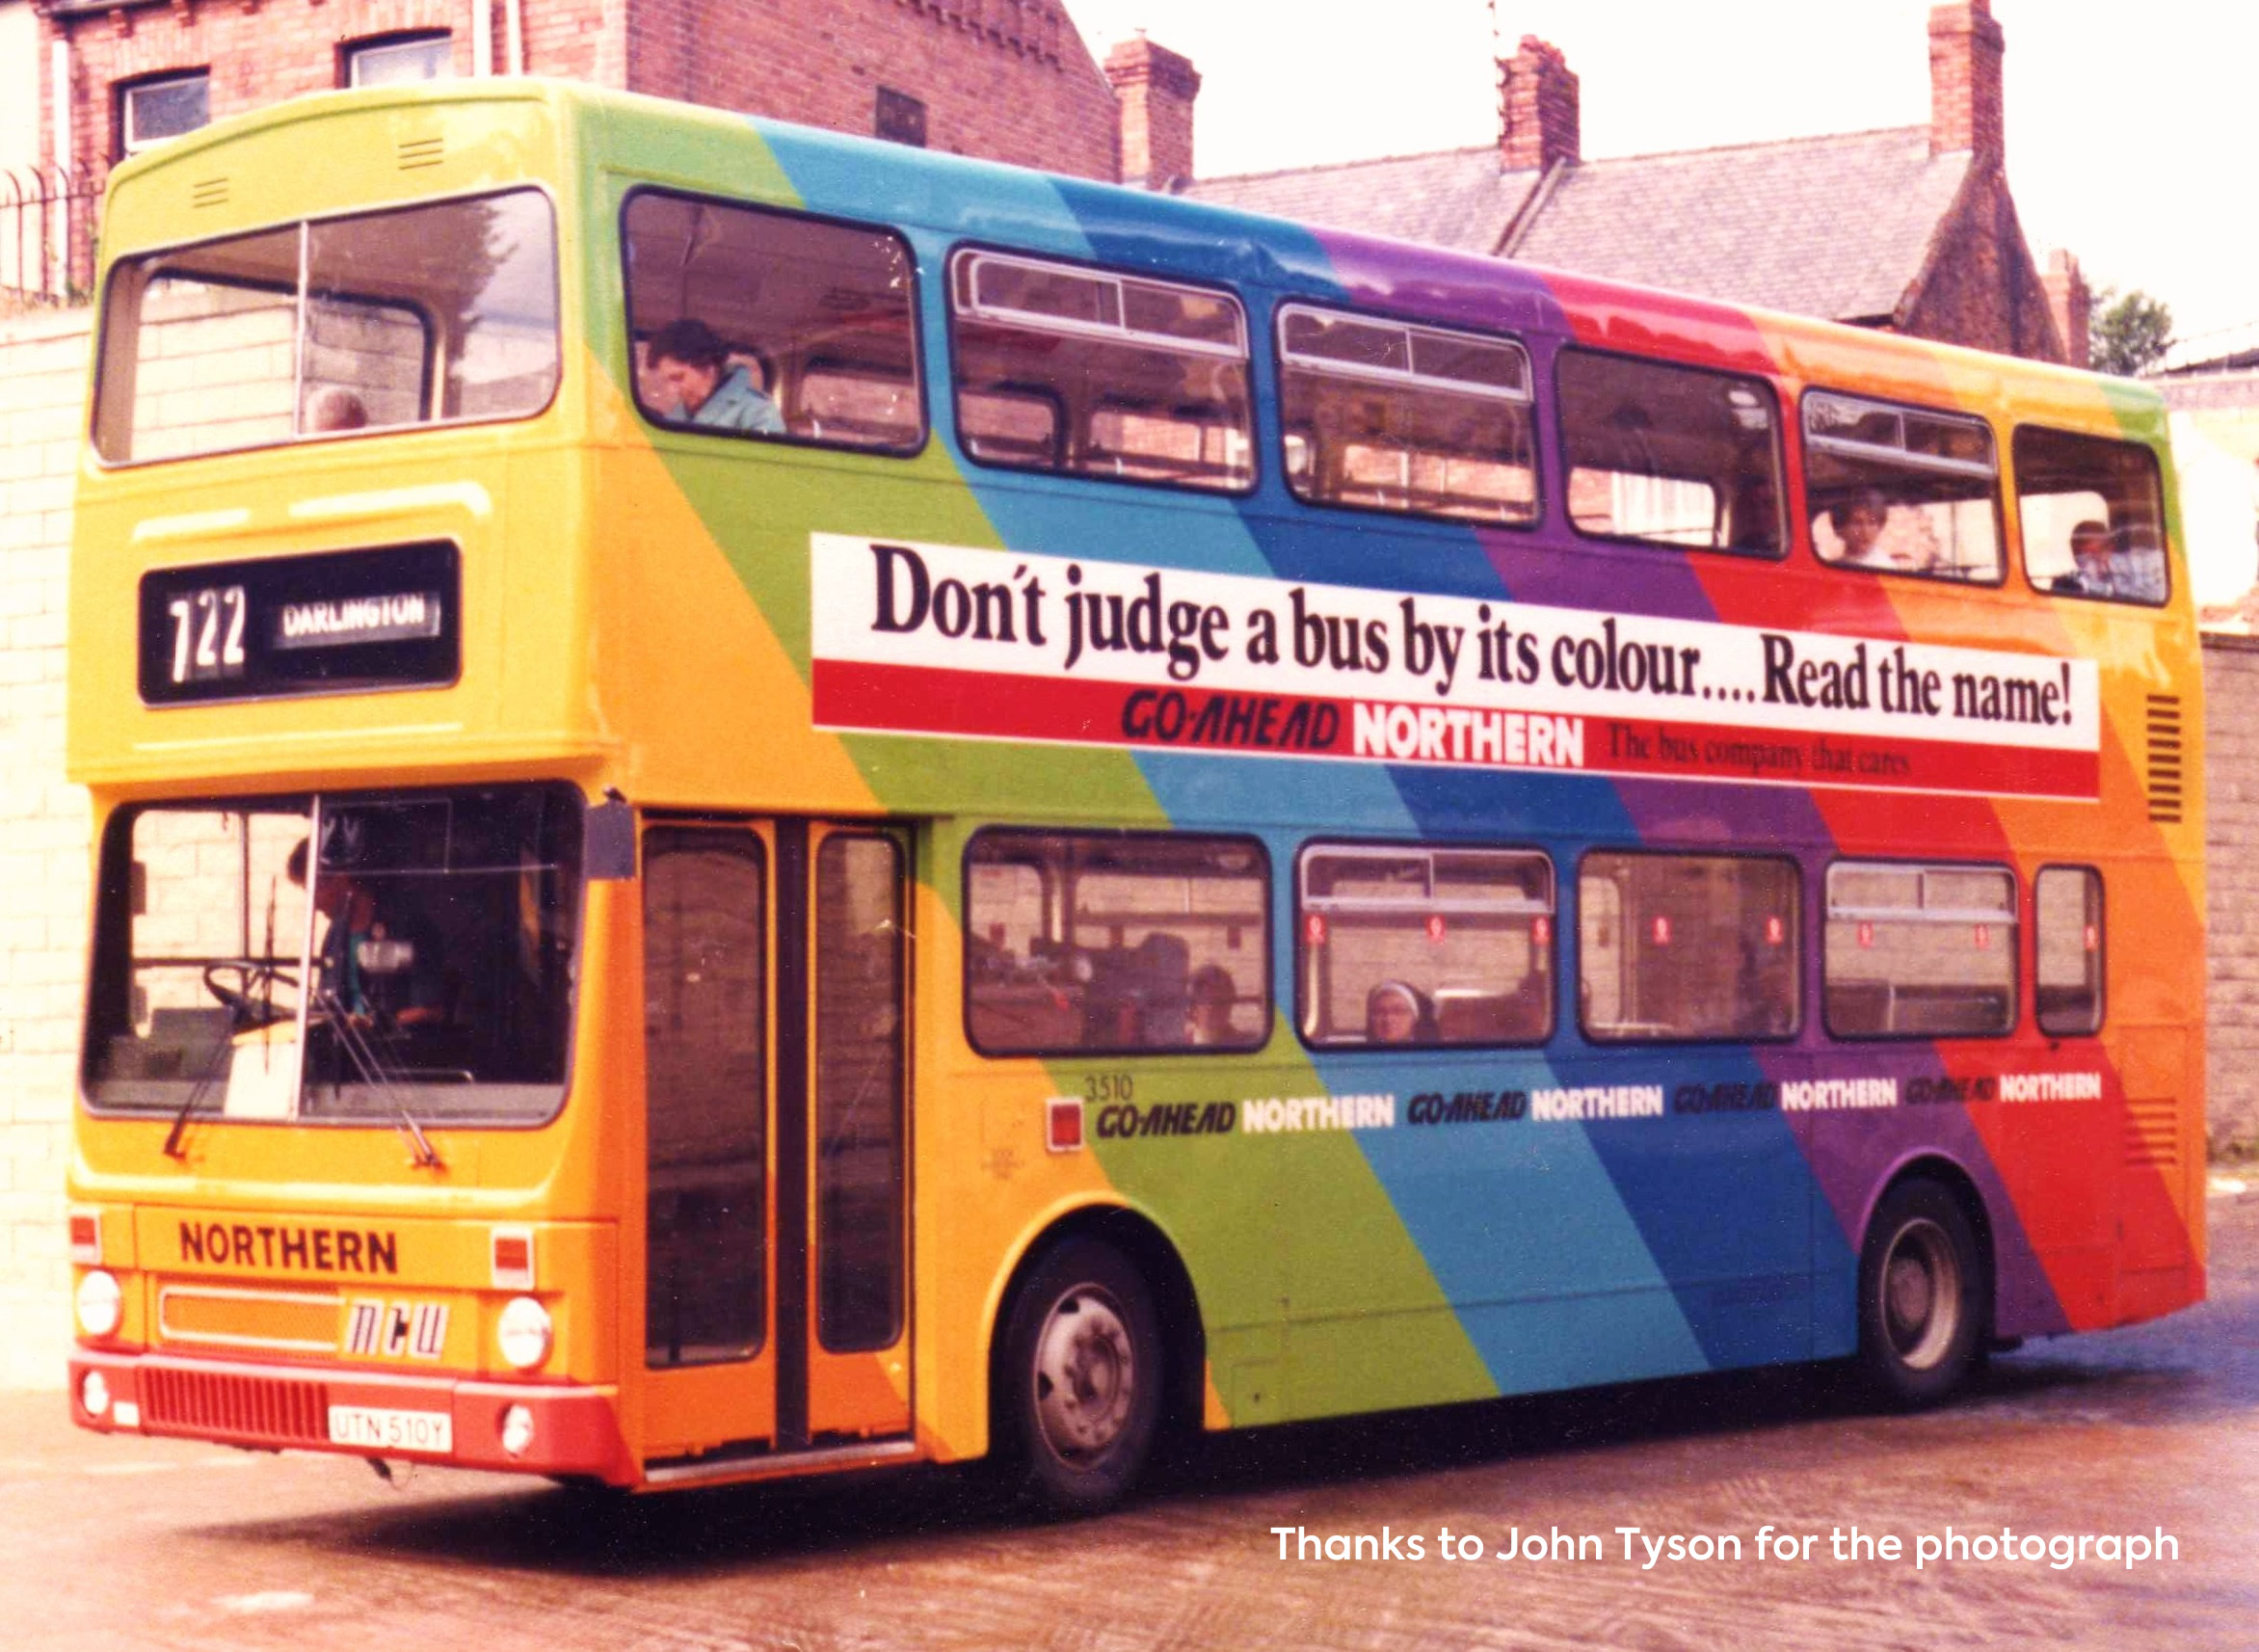 Original bus from 1985